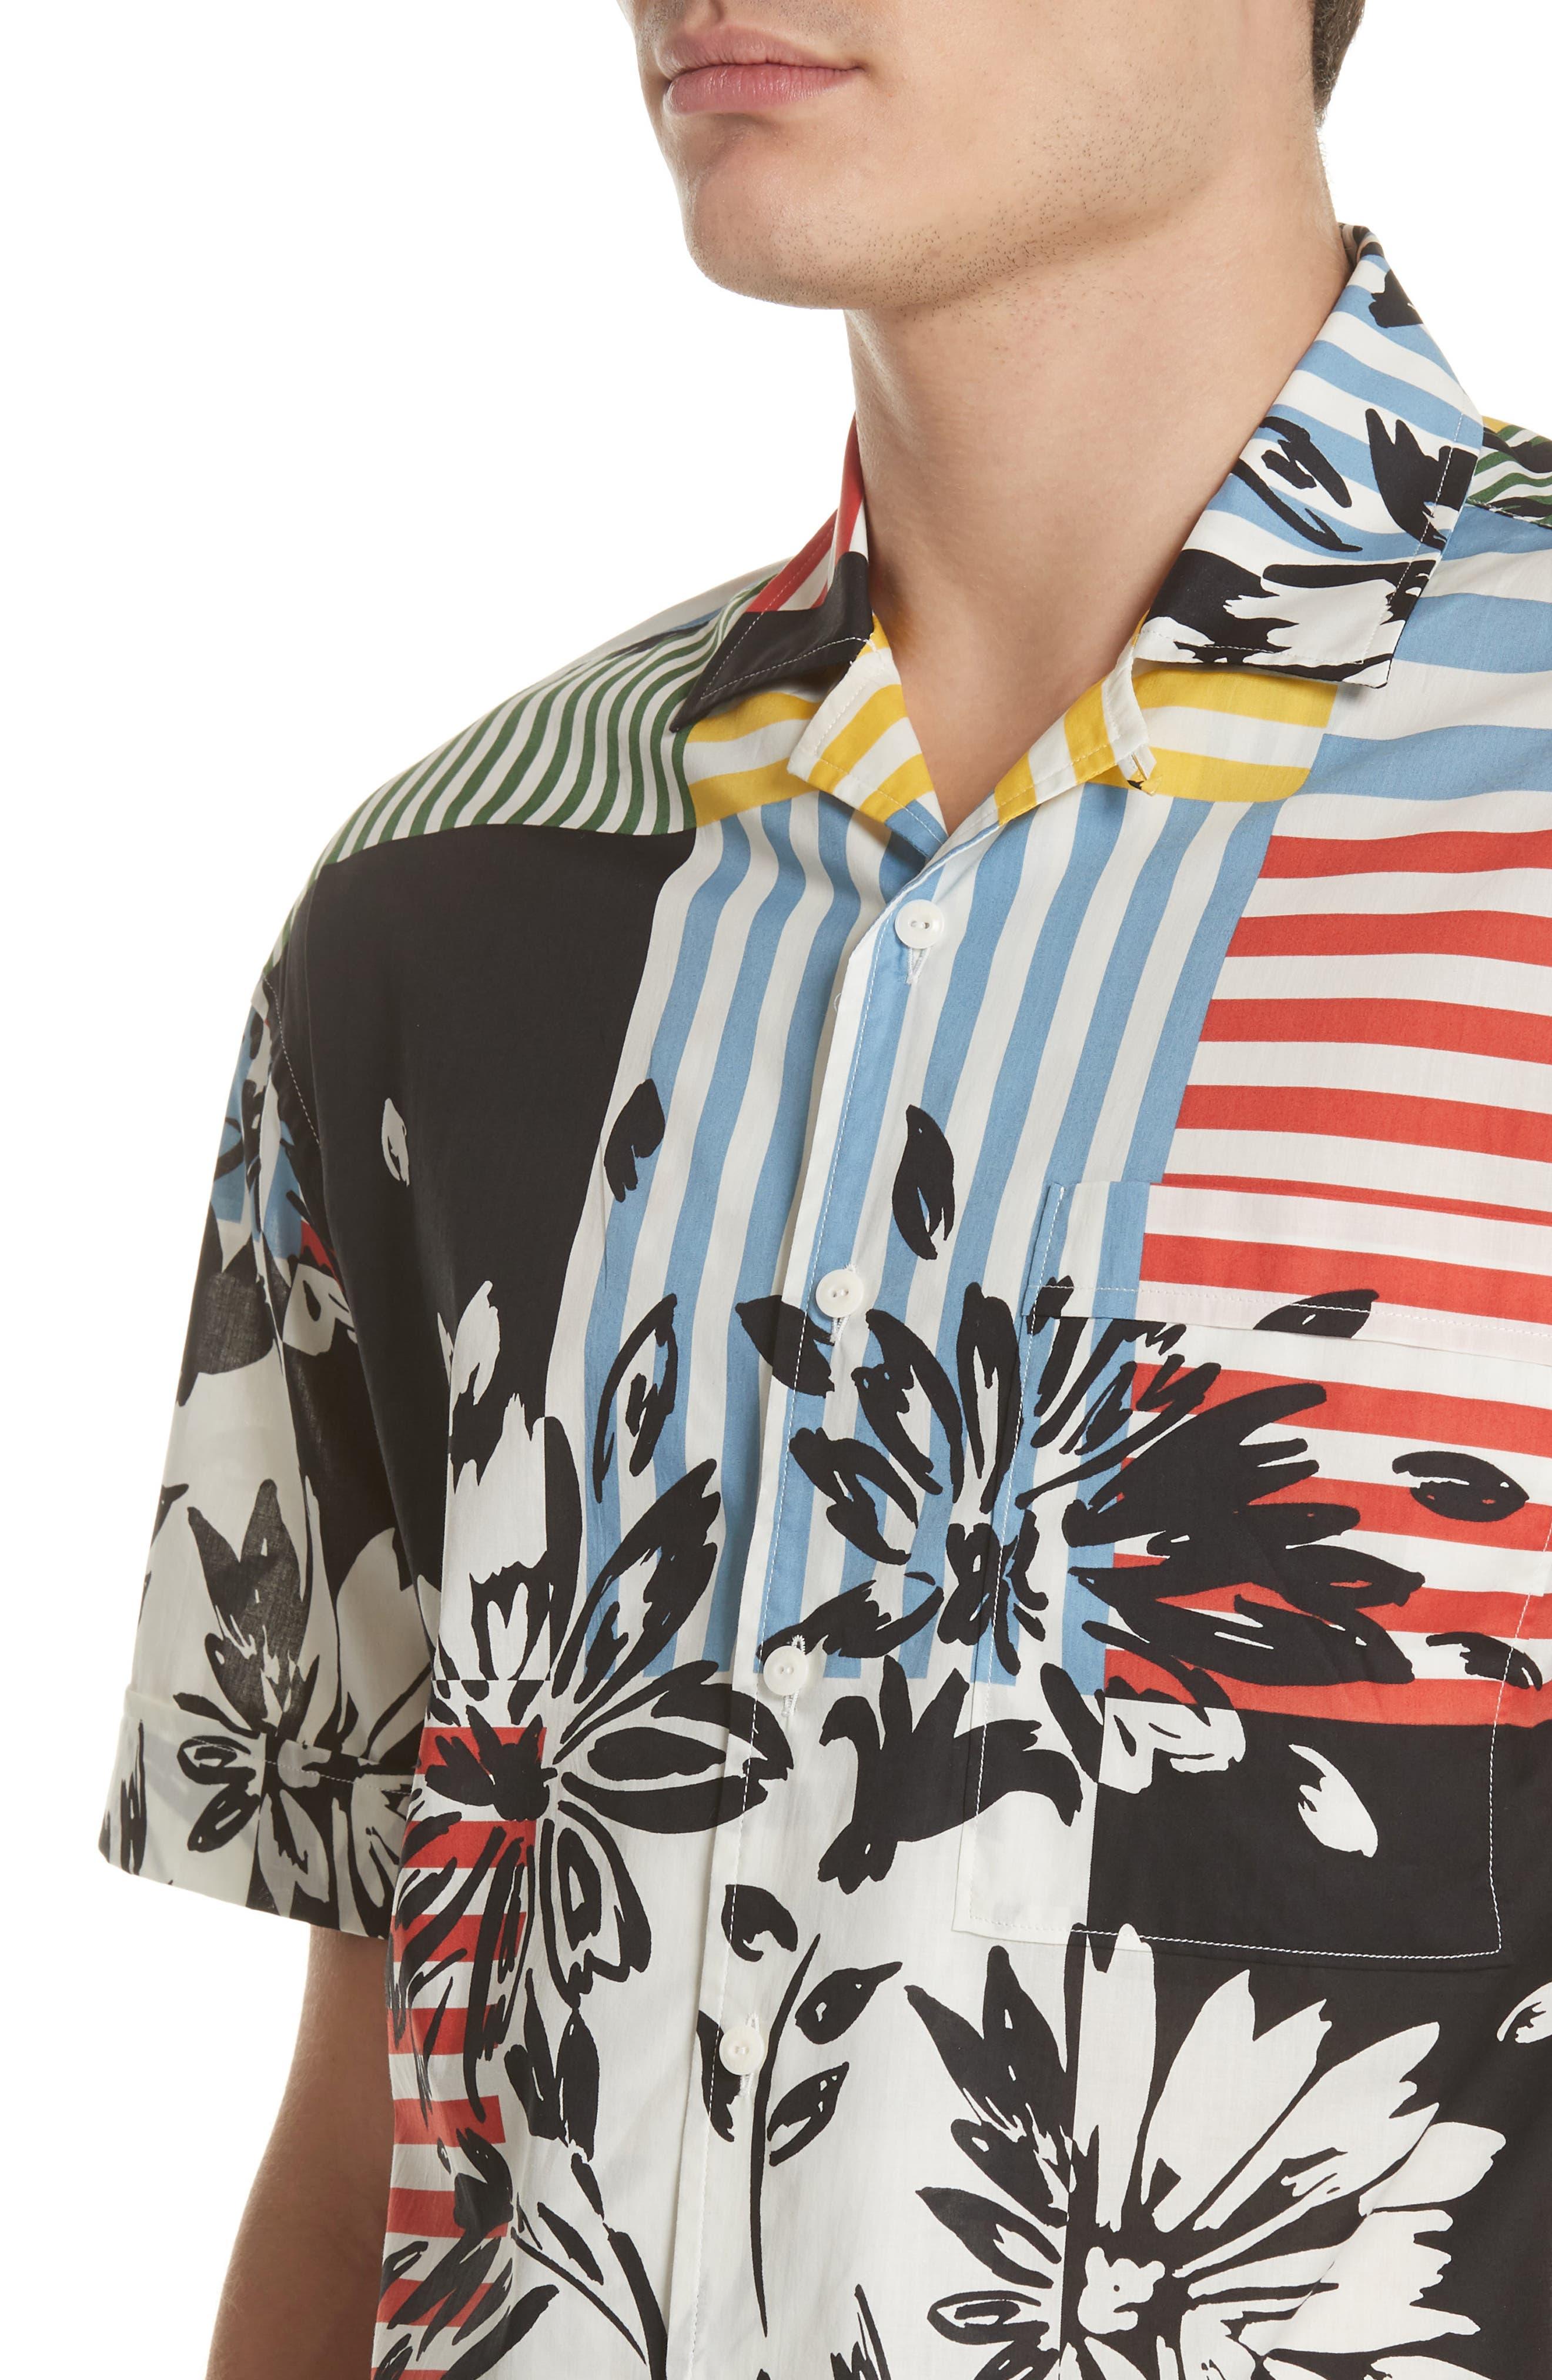 Harley Print Shirt,                             Alternate thumbnail 4, color,                             409